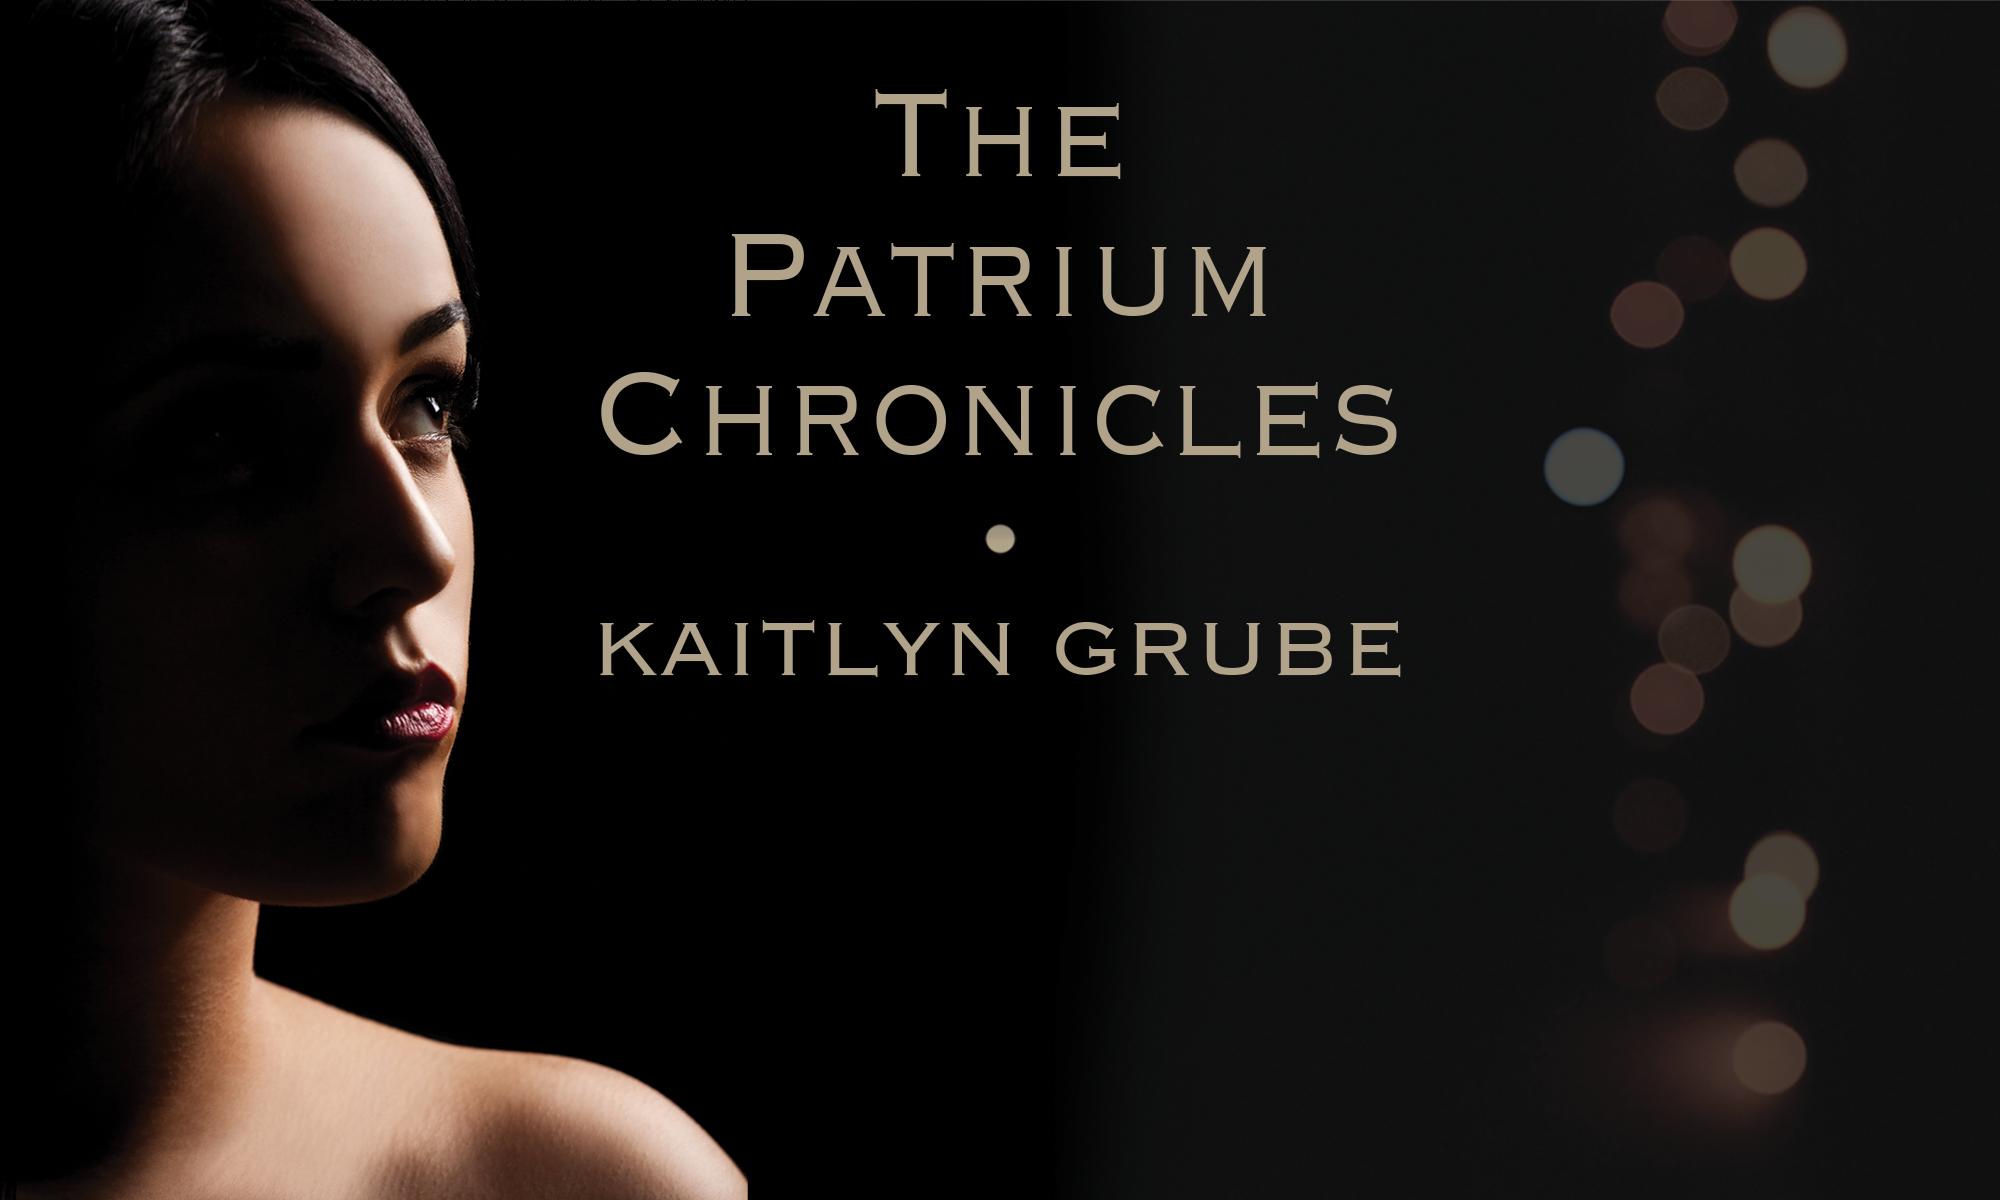 Kaitlyn Grube